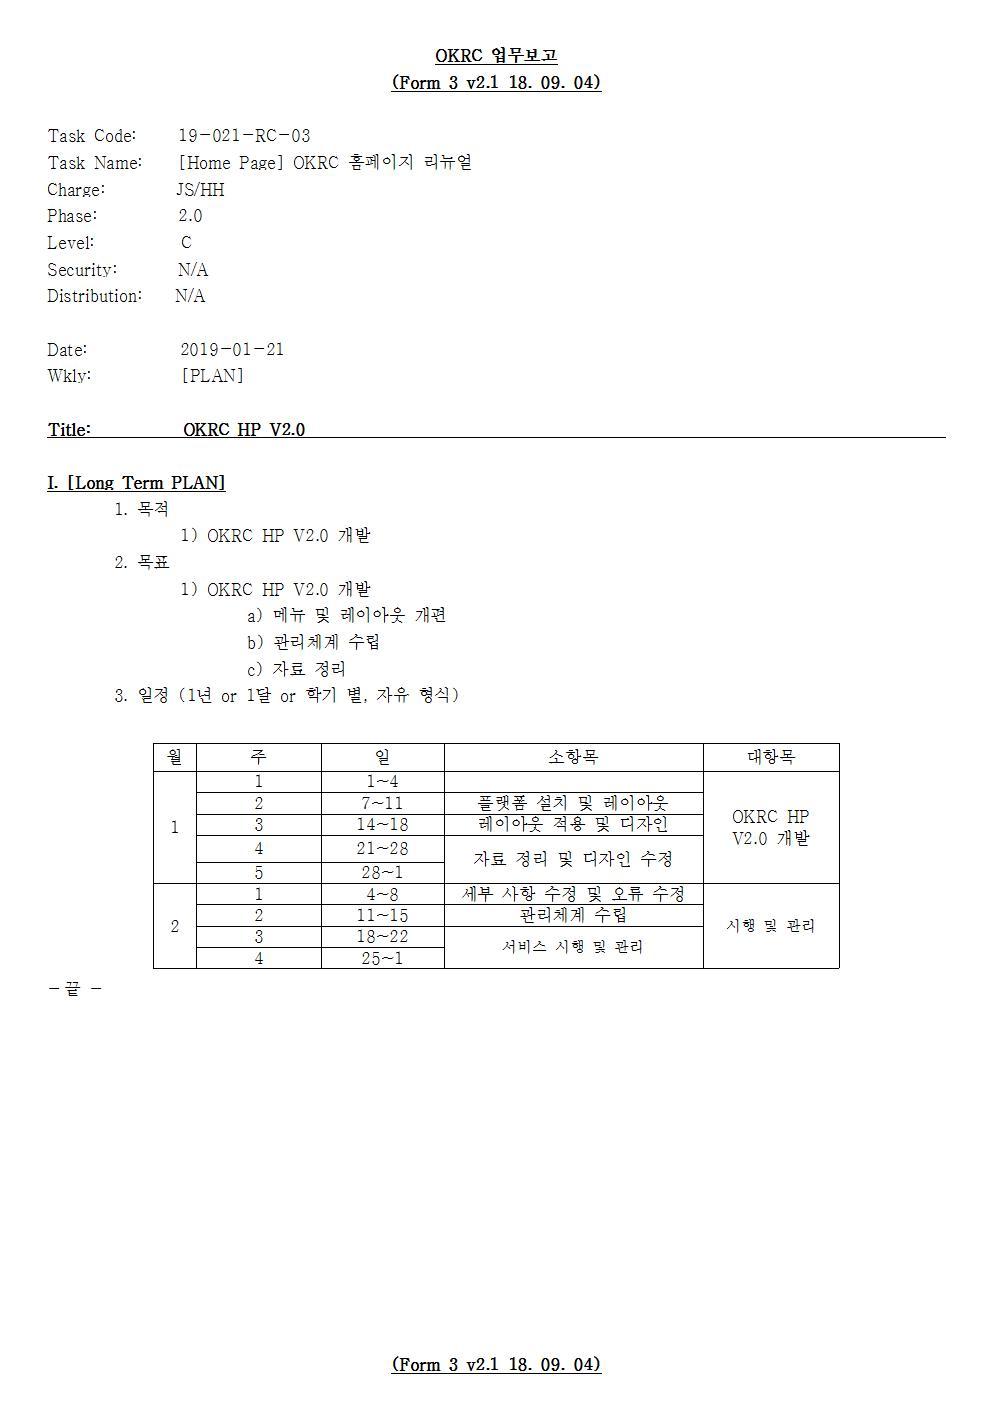 D-[19-021-RC-03]-[OKRCHP V2.0]-[2019-01-21][HH]001.jpg